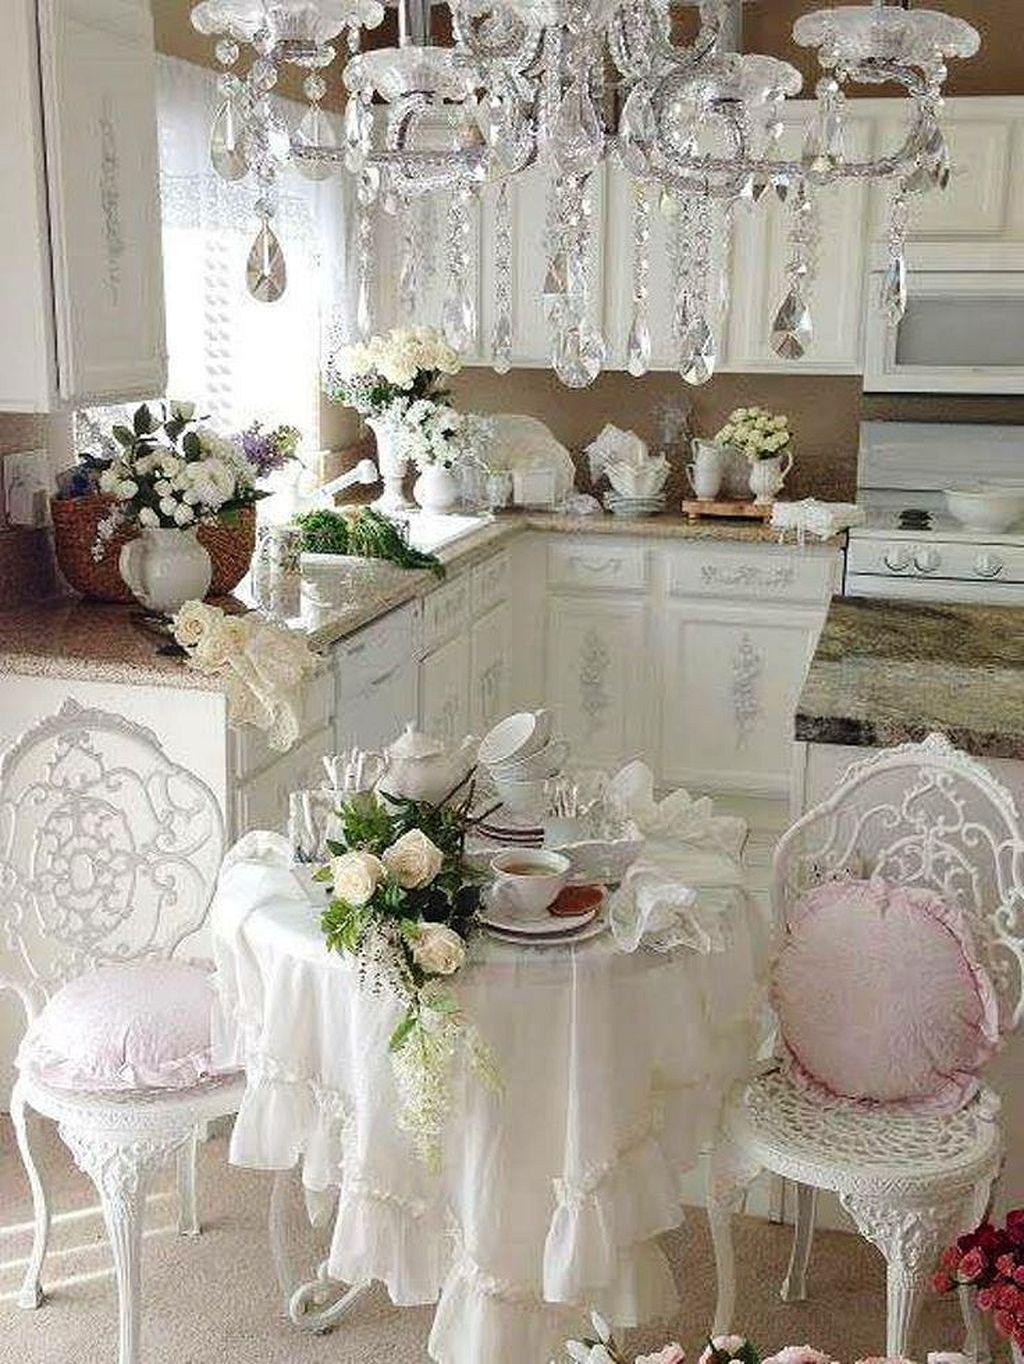 Stunning 50+ Shabby Chic Cottage Interior Design Inspiration https ...